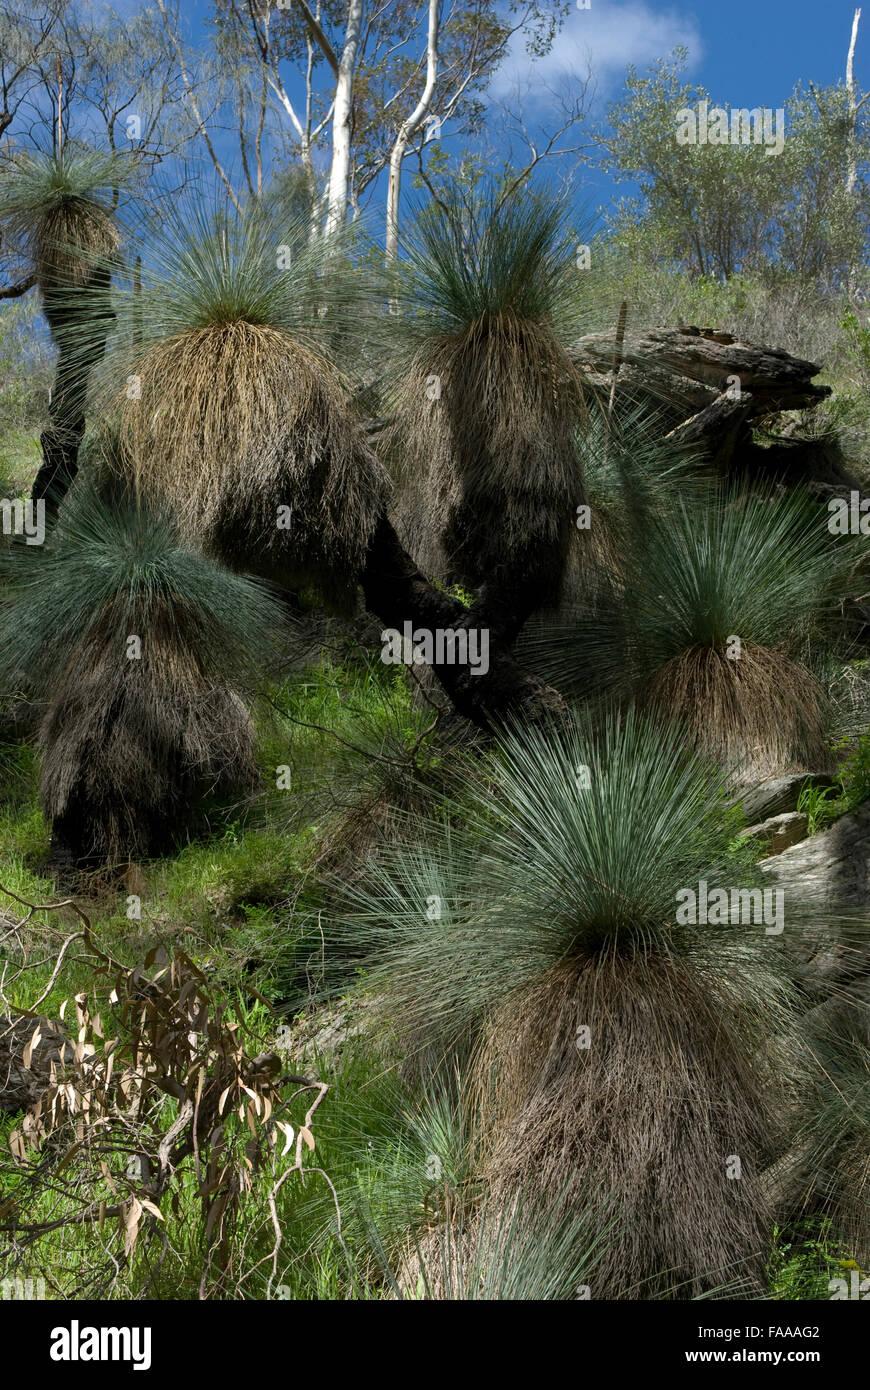 South Australian bushland including multiple 'blackboy' plants of the 'Xanthorrhoea' genus, mid - Stock Image